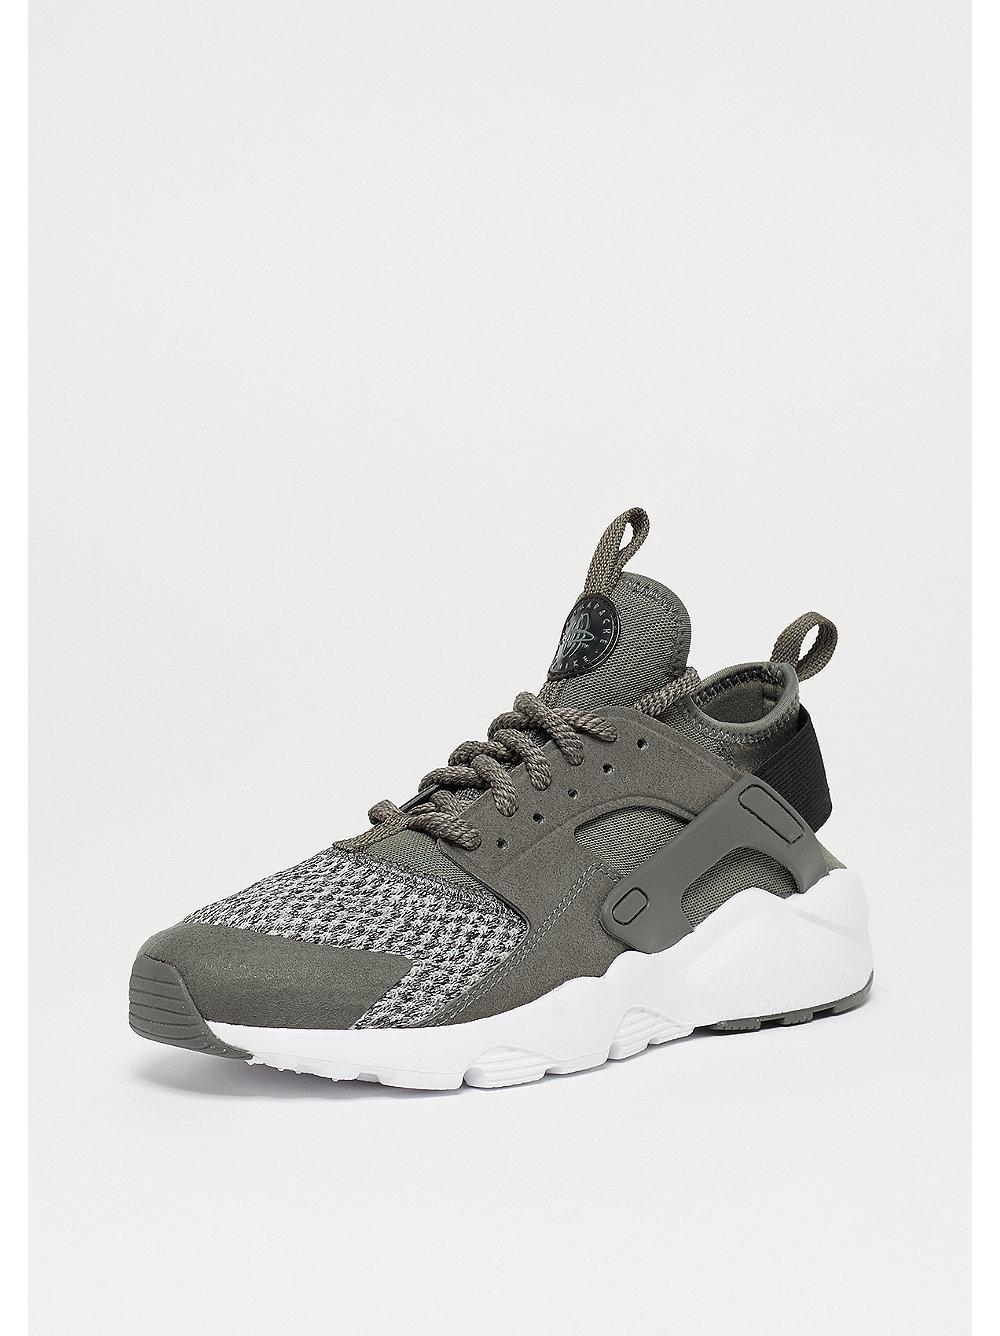 AIR HUARACHE RUN ULTRA - Sneaker low - black/dark grey/sail u8be3h